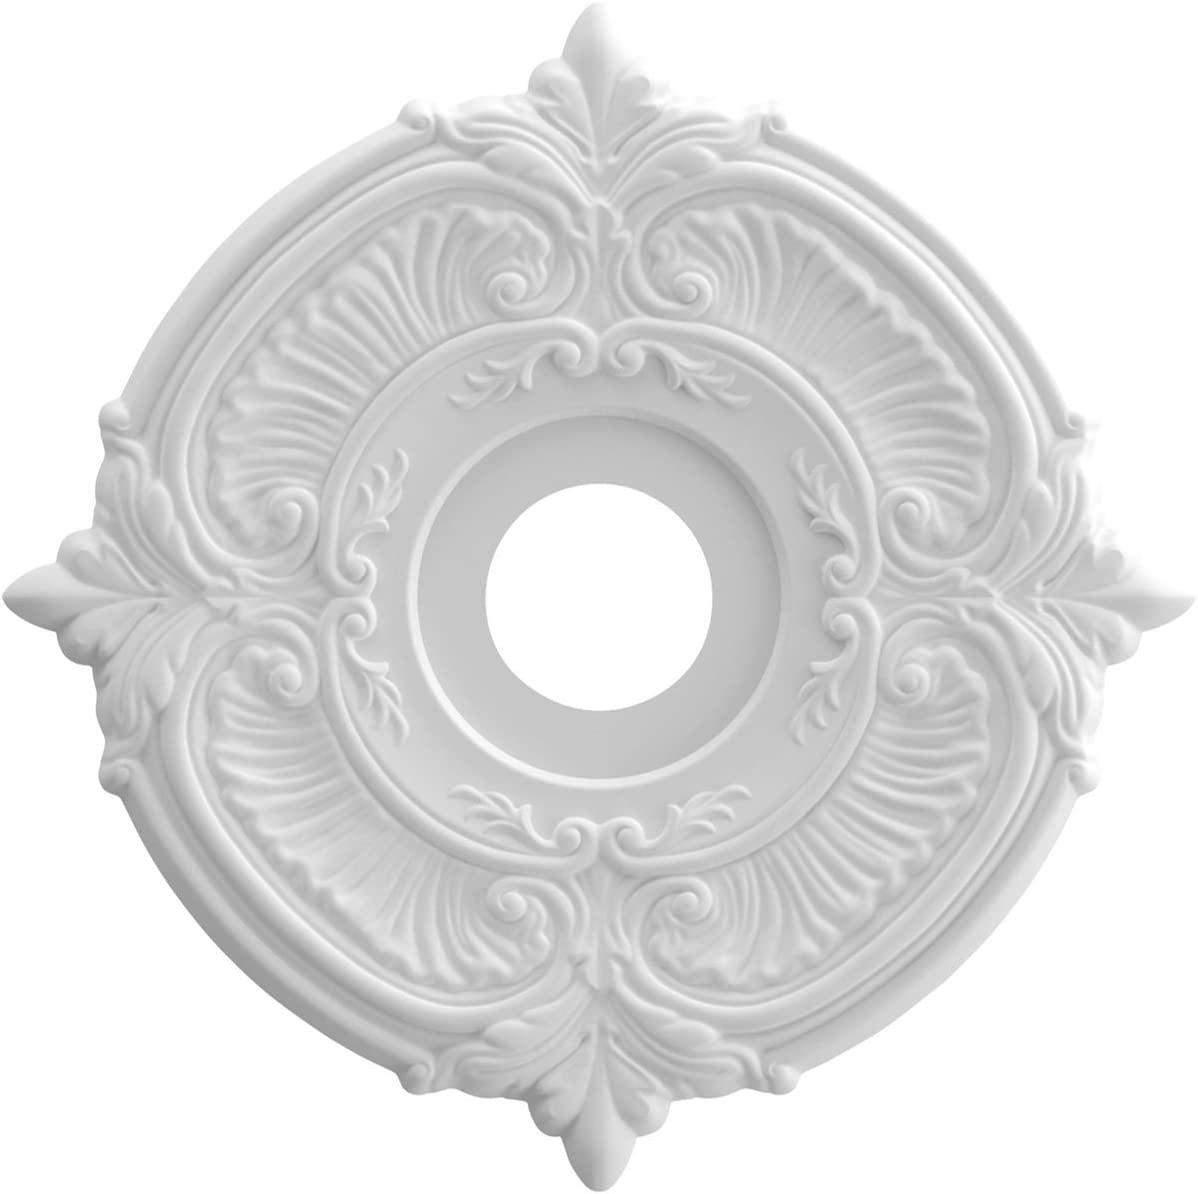 "Ekena Millwork CMP16AT Attica Thermoformed PVC Ceiling Medallion, 16""OD x 3 1/2""ID x 1"" P, White"